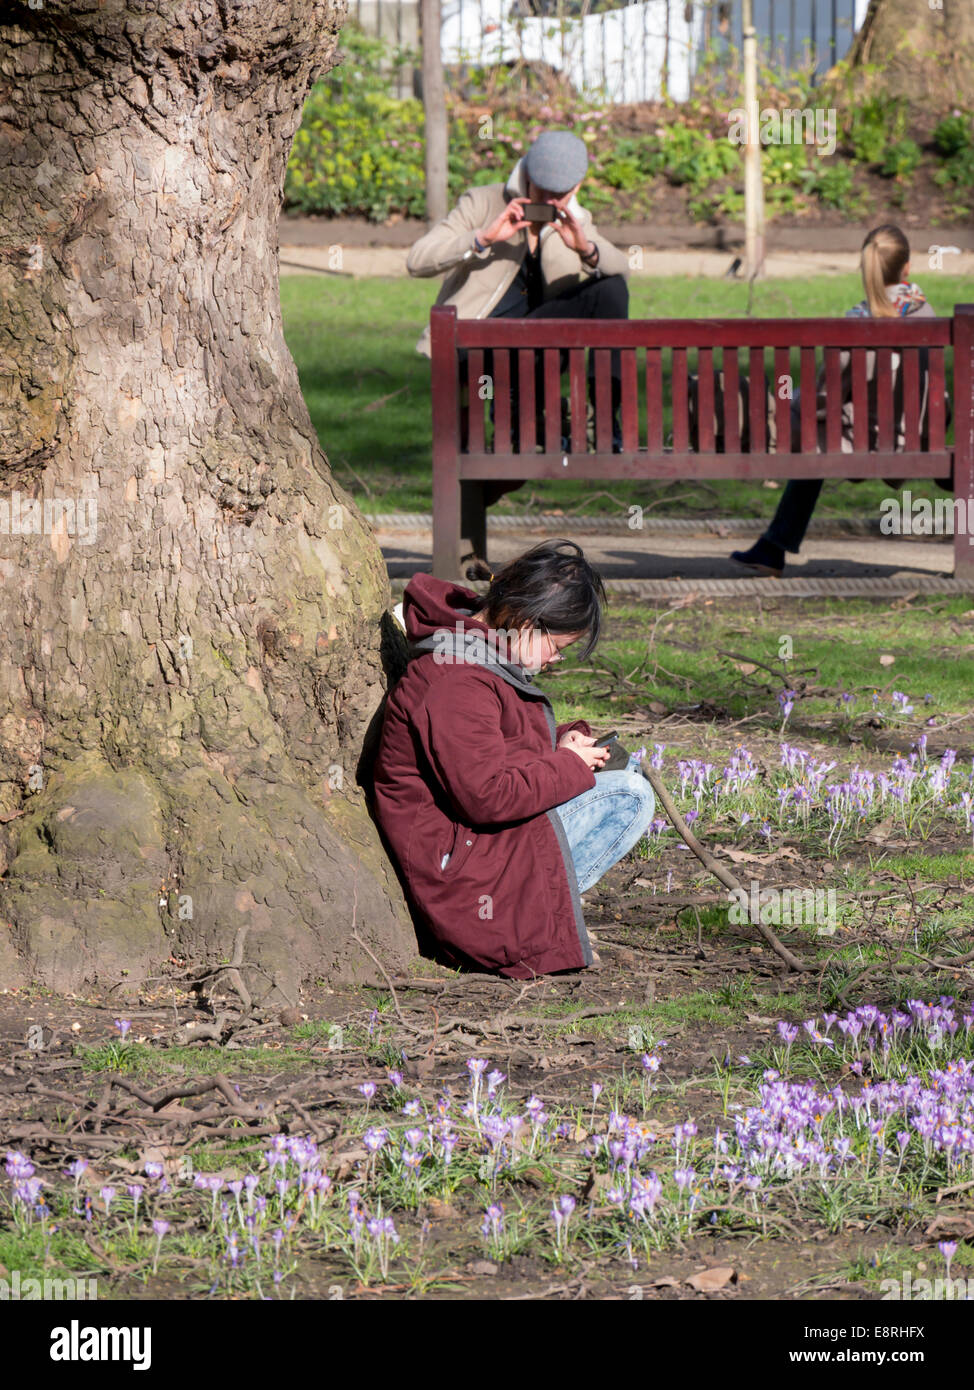 europe, UK, England, London, Tavistock Square - Stock Image